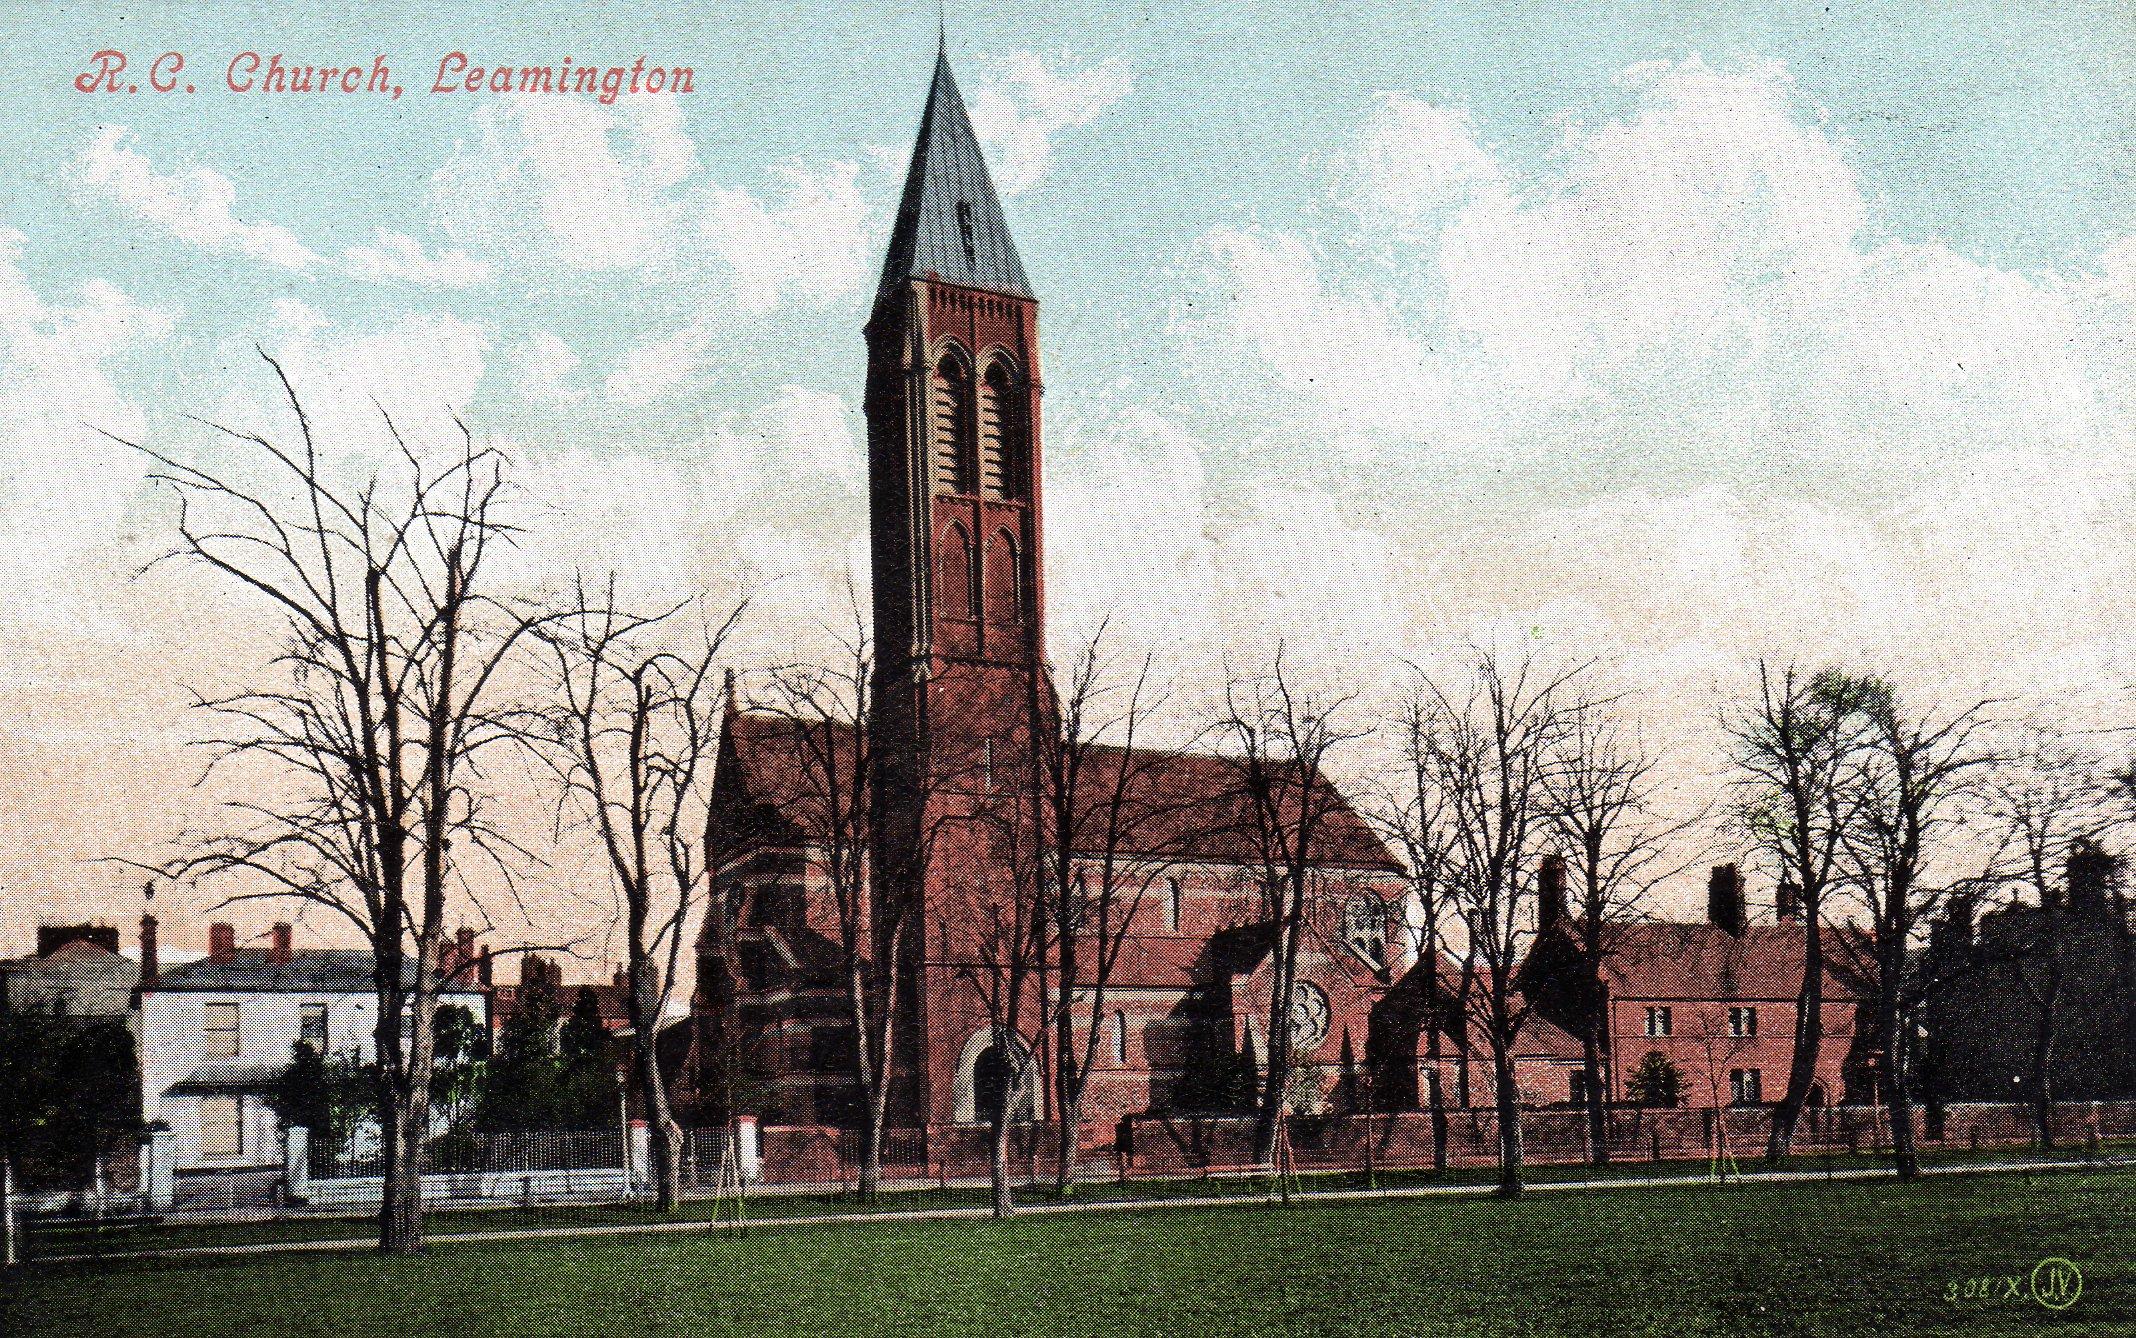 St. Peter's RC Church